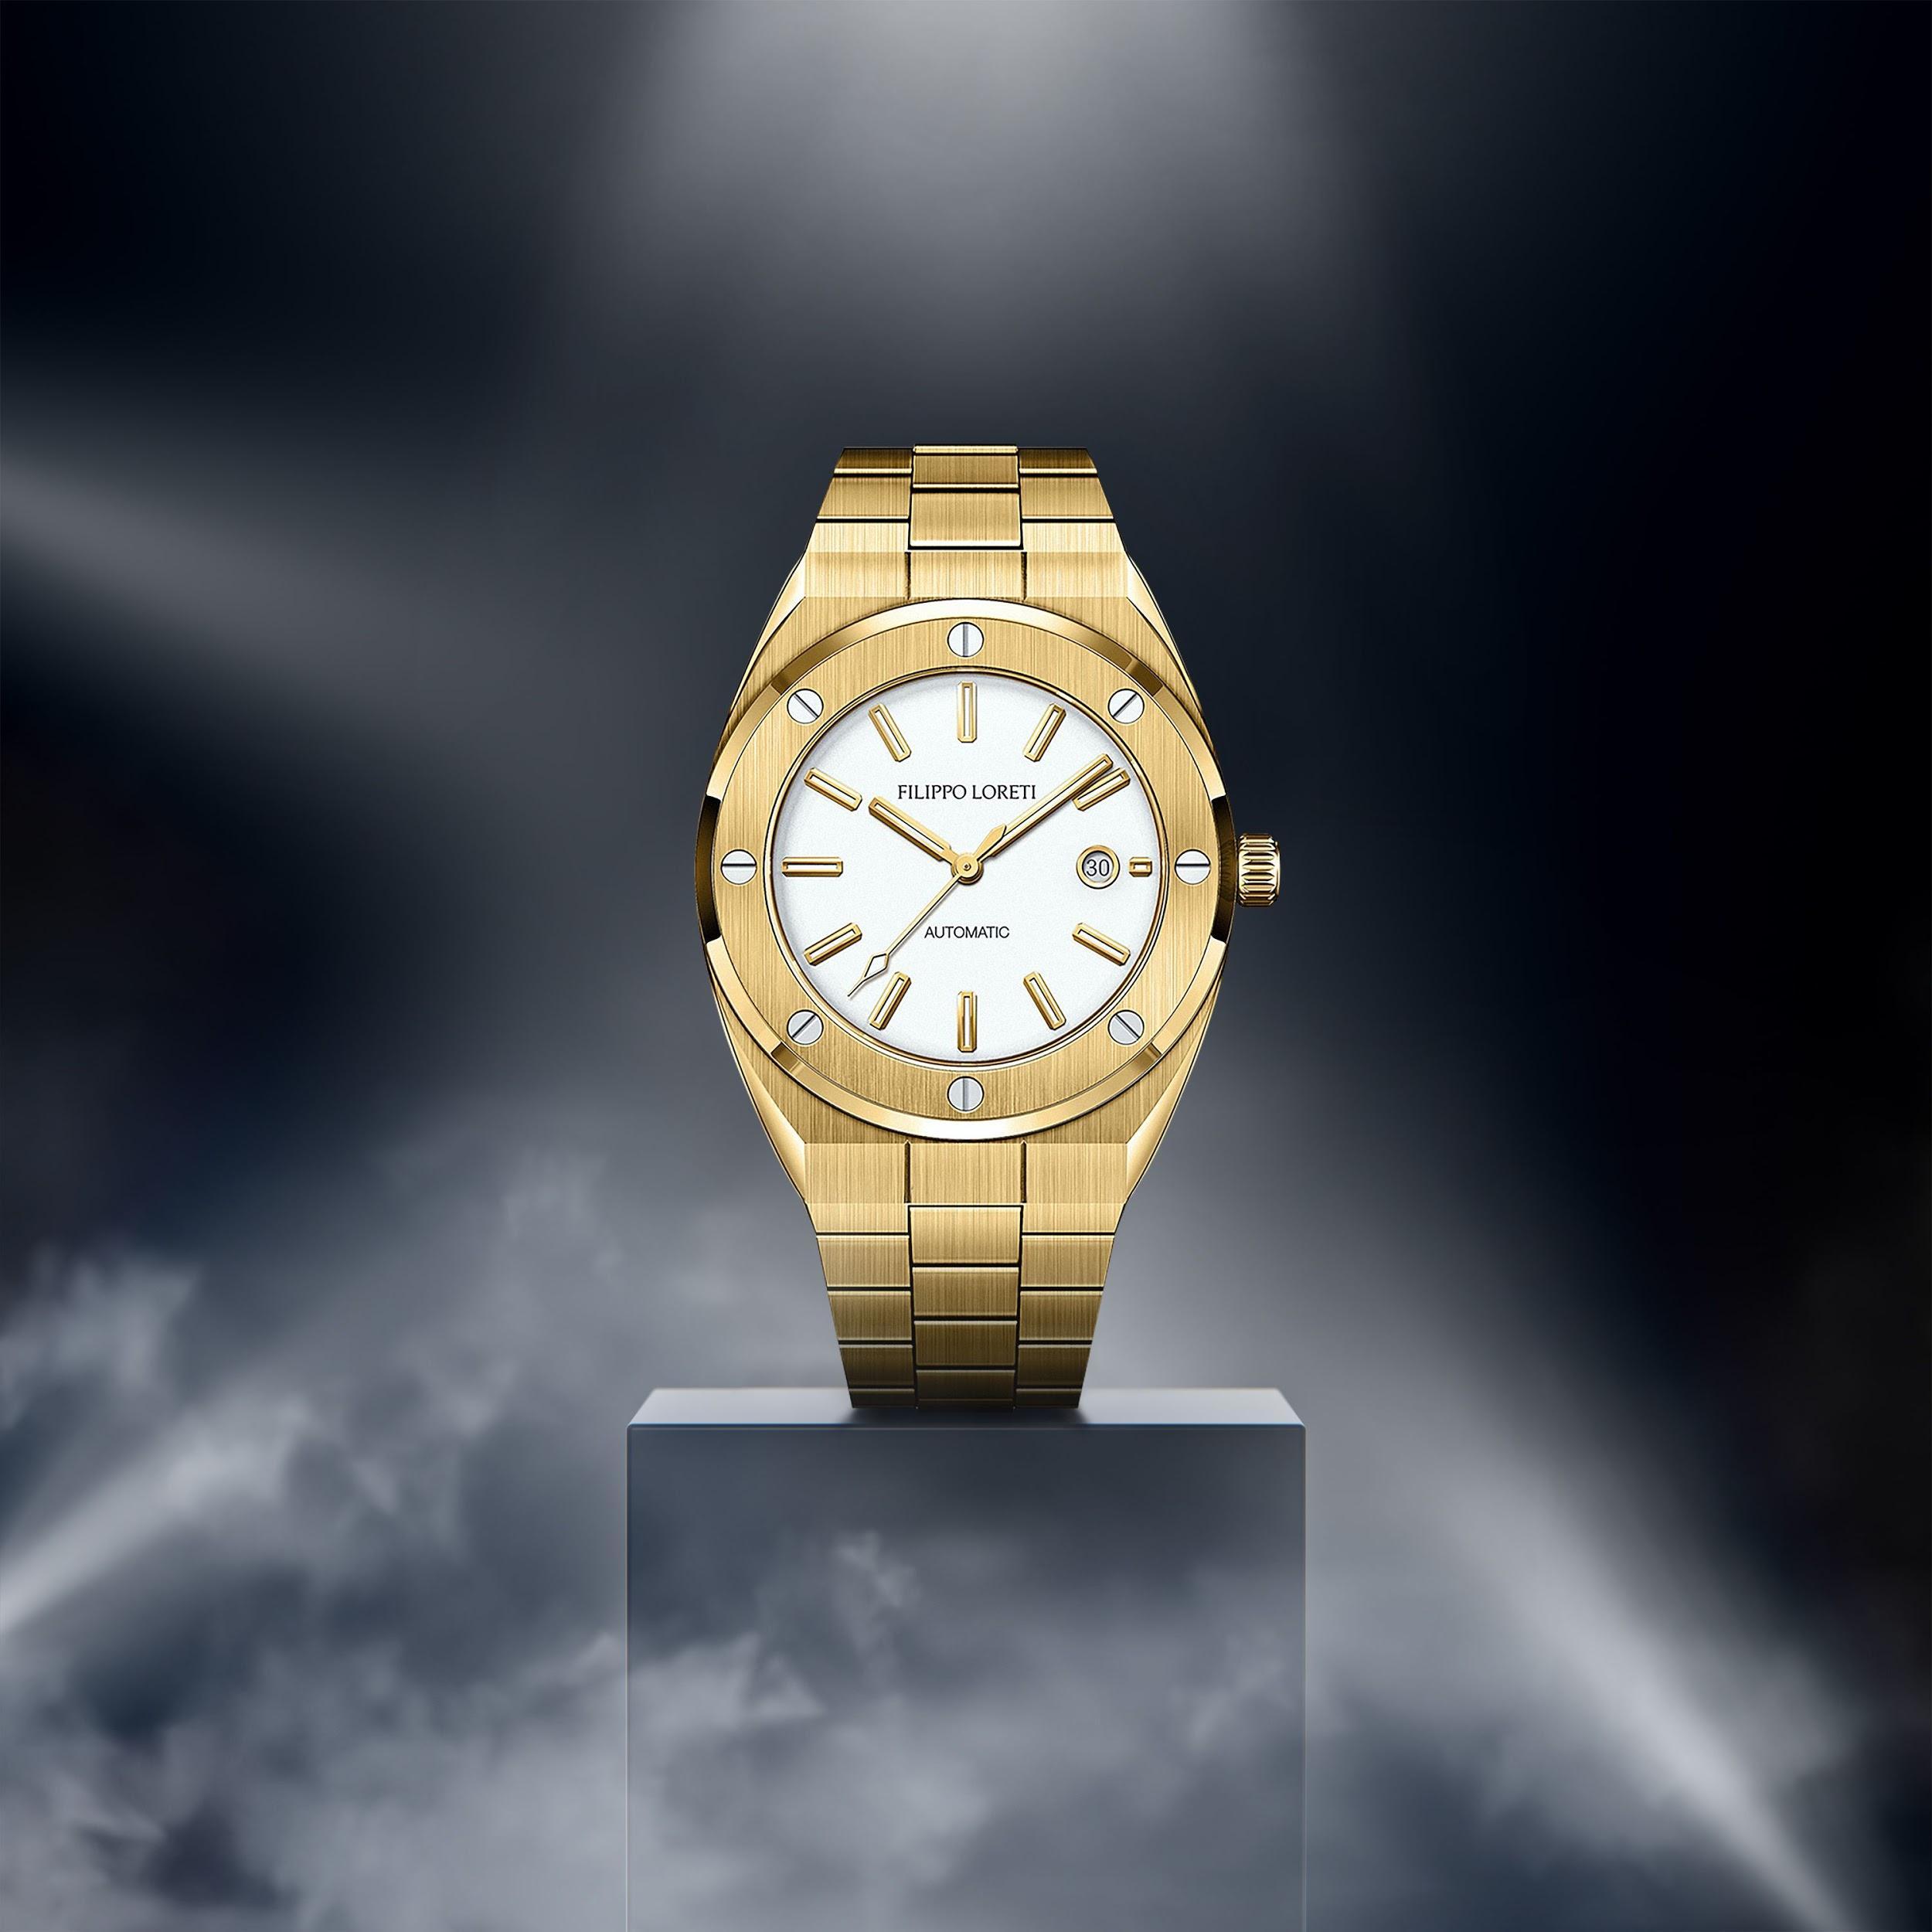 Florence Gold Automatic Watch from Filippo Loreti